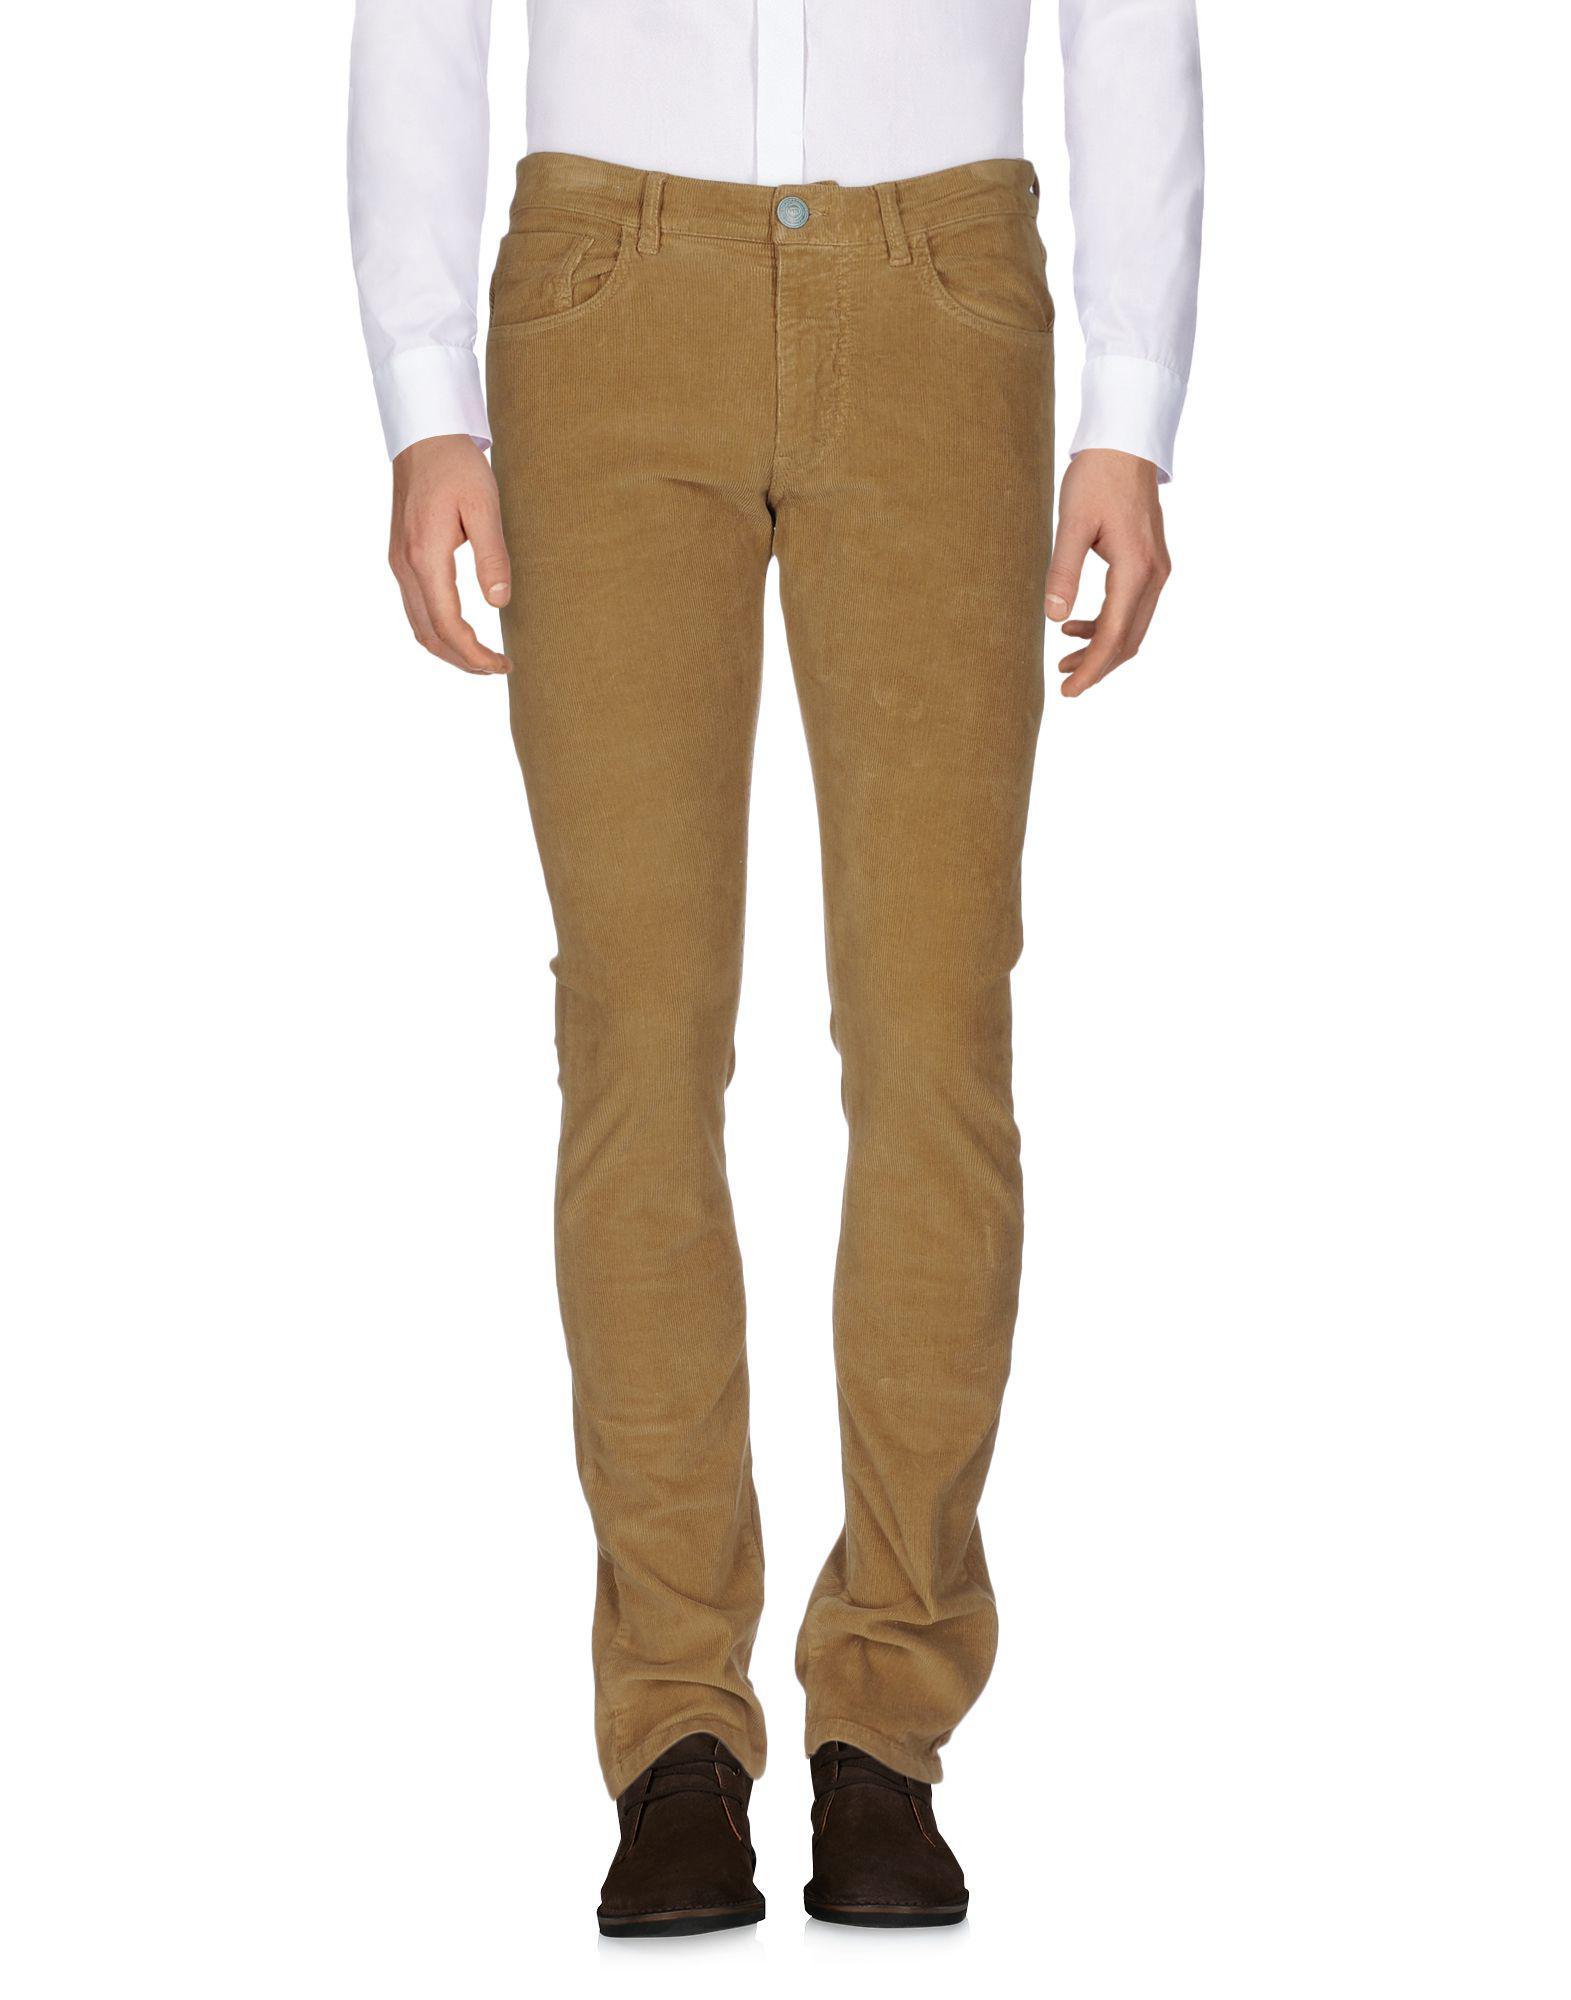 TROUSERS - Casual trousers Historic vVjtt6t9Rf